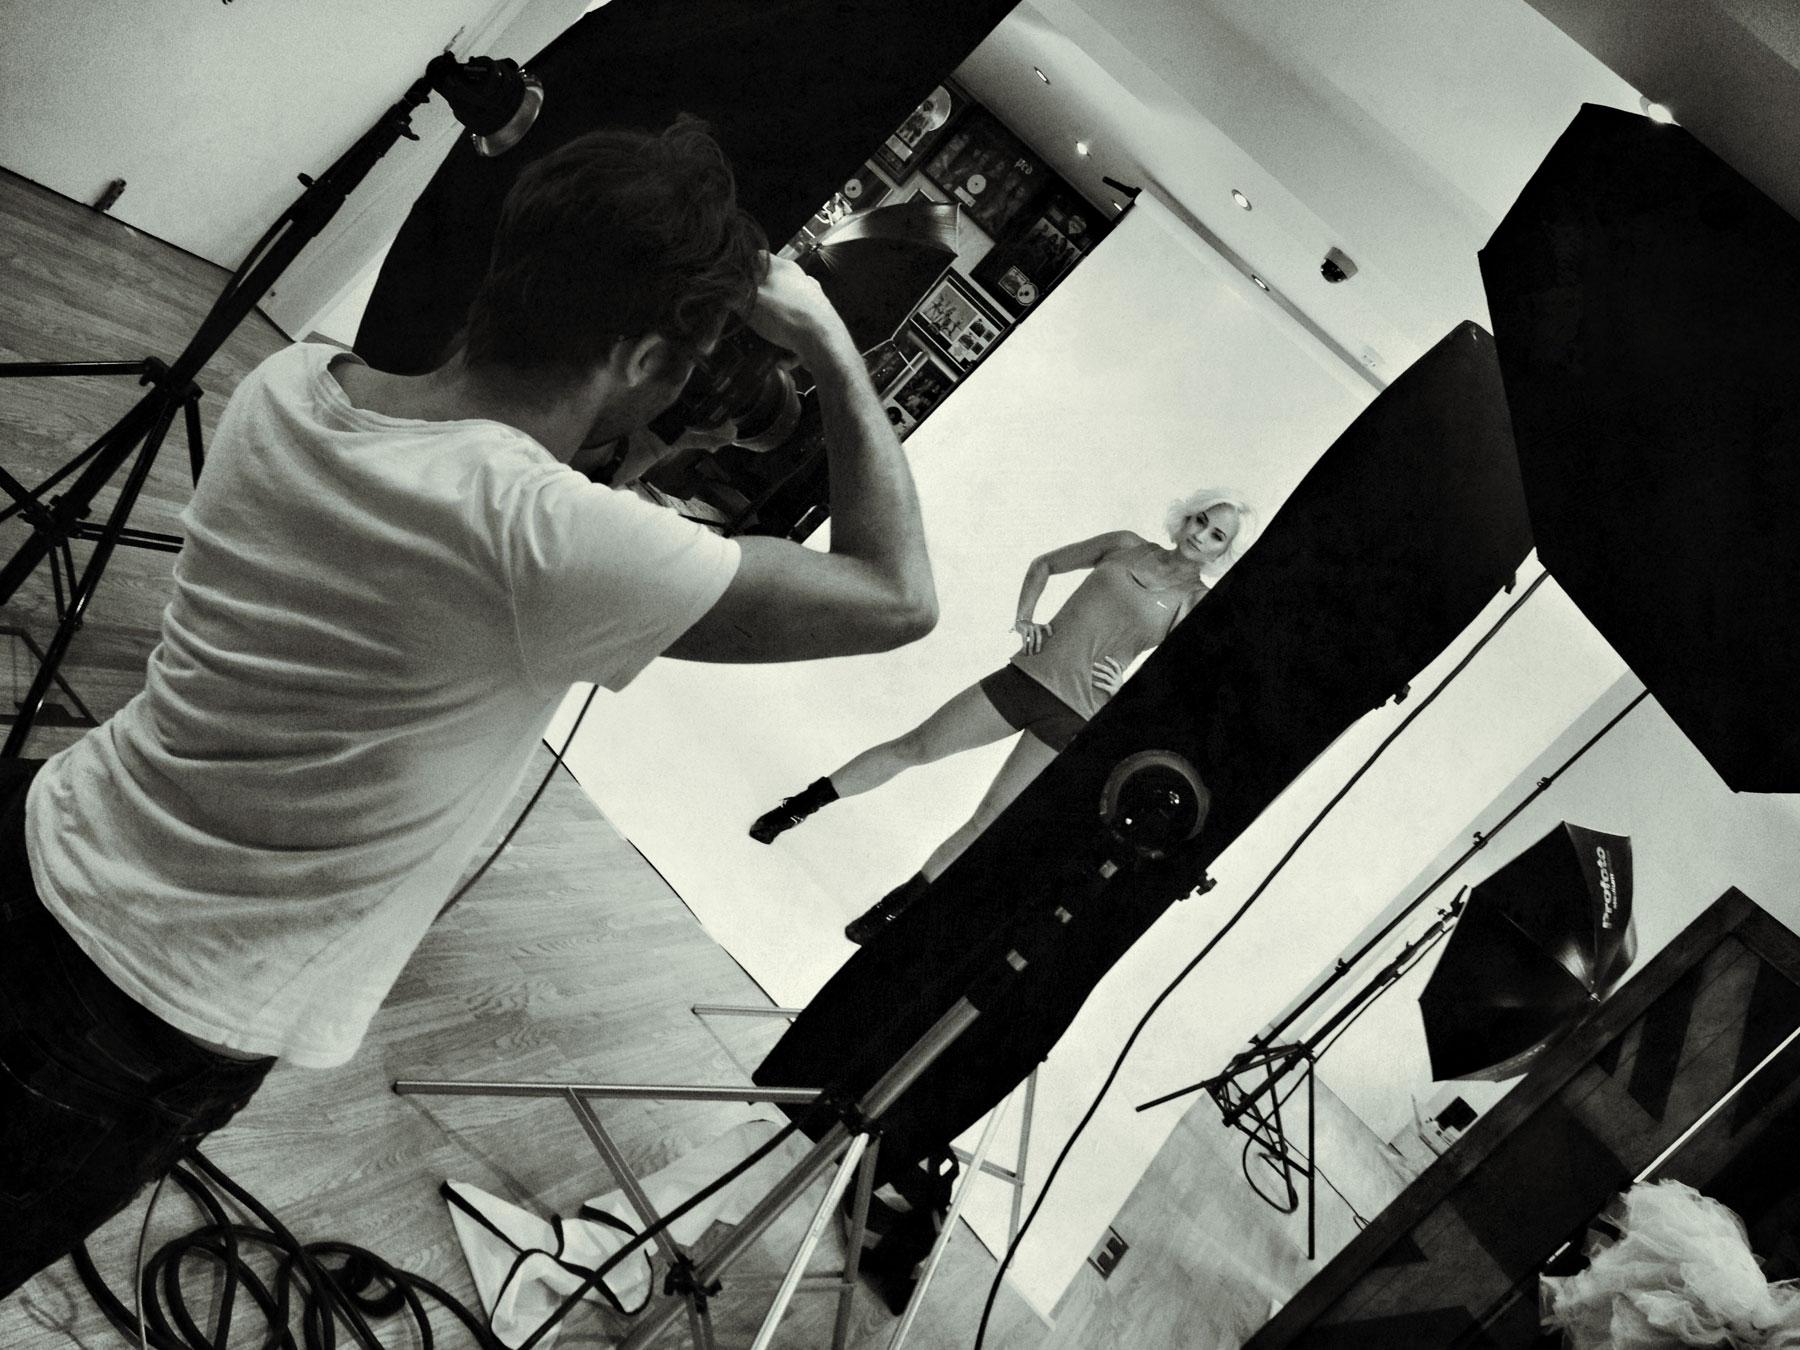 Behind the scenes on a Kimberly Wyatt photoshoot